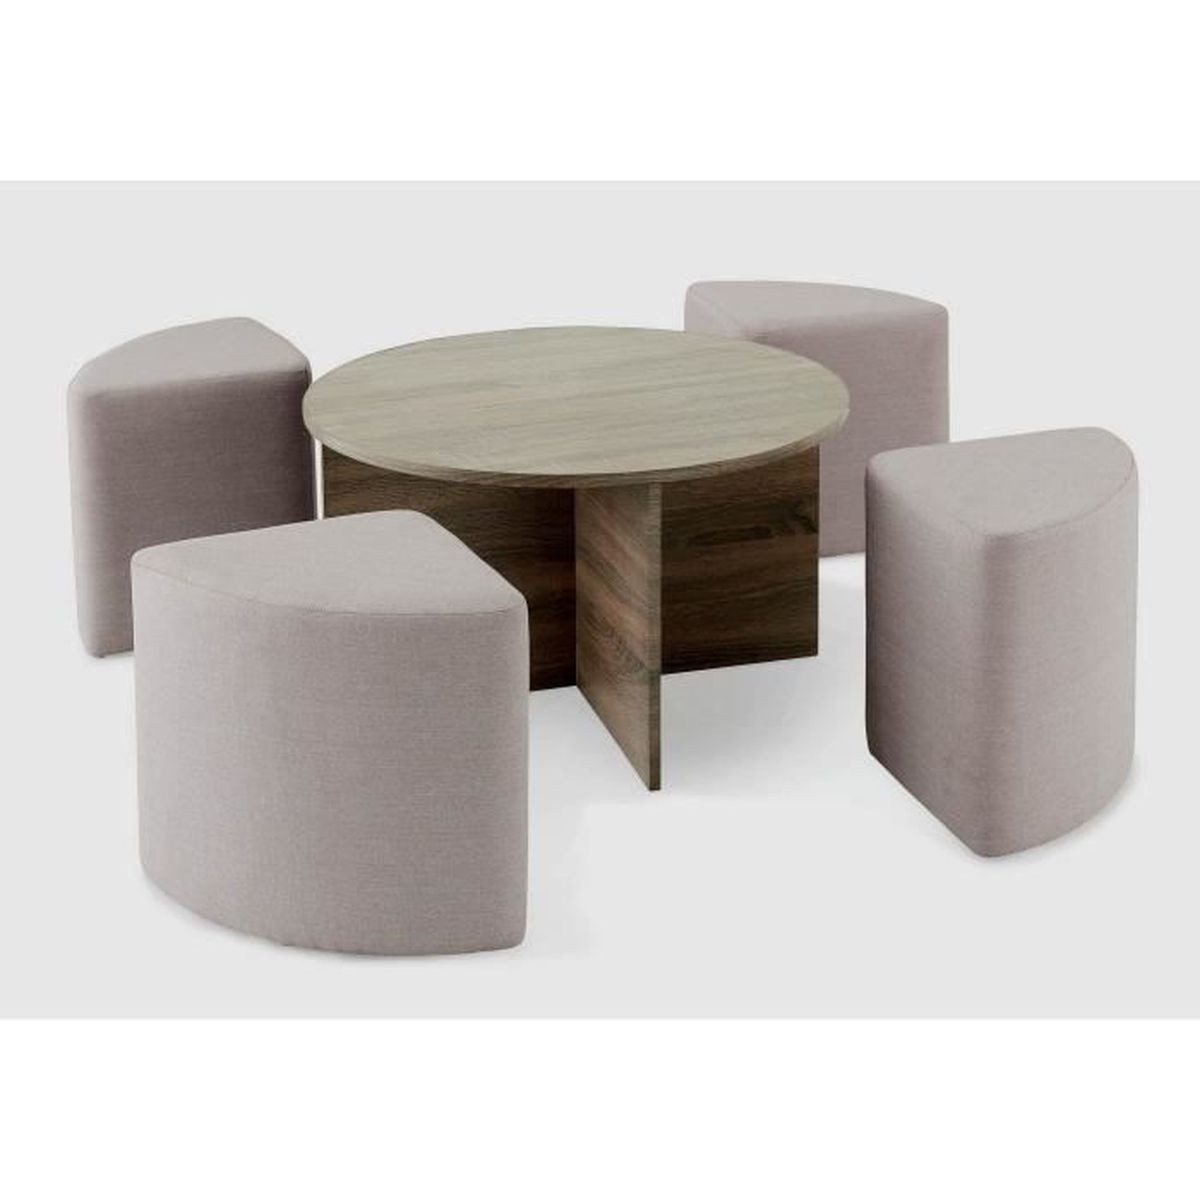 Inside 75 Table Basse Ronde 65cm Fancy En Bois Teinte Naturelle Style Scandinave Table Basse Ronde Petite Table Basse Ronde Petite Table Basse